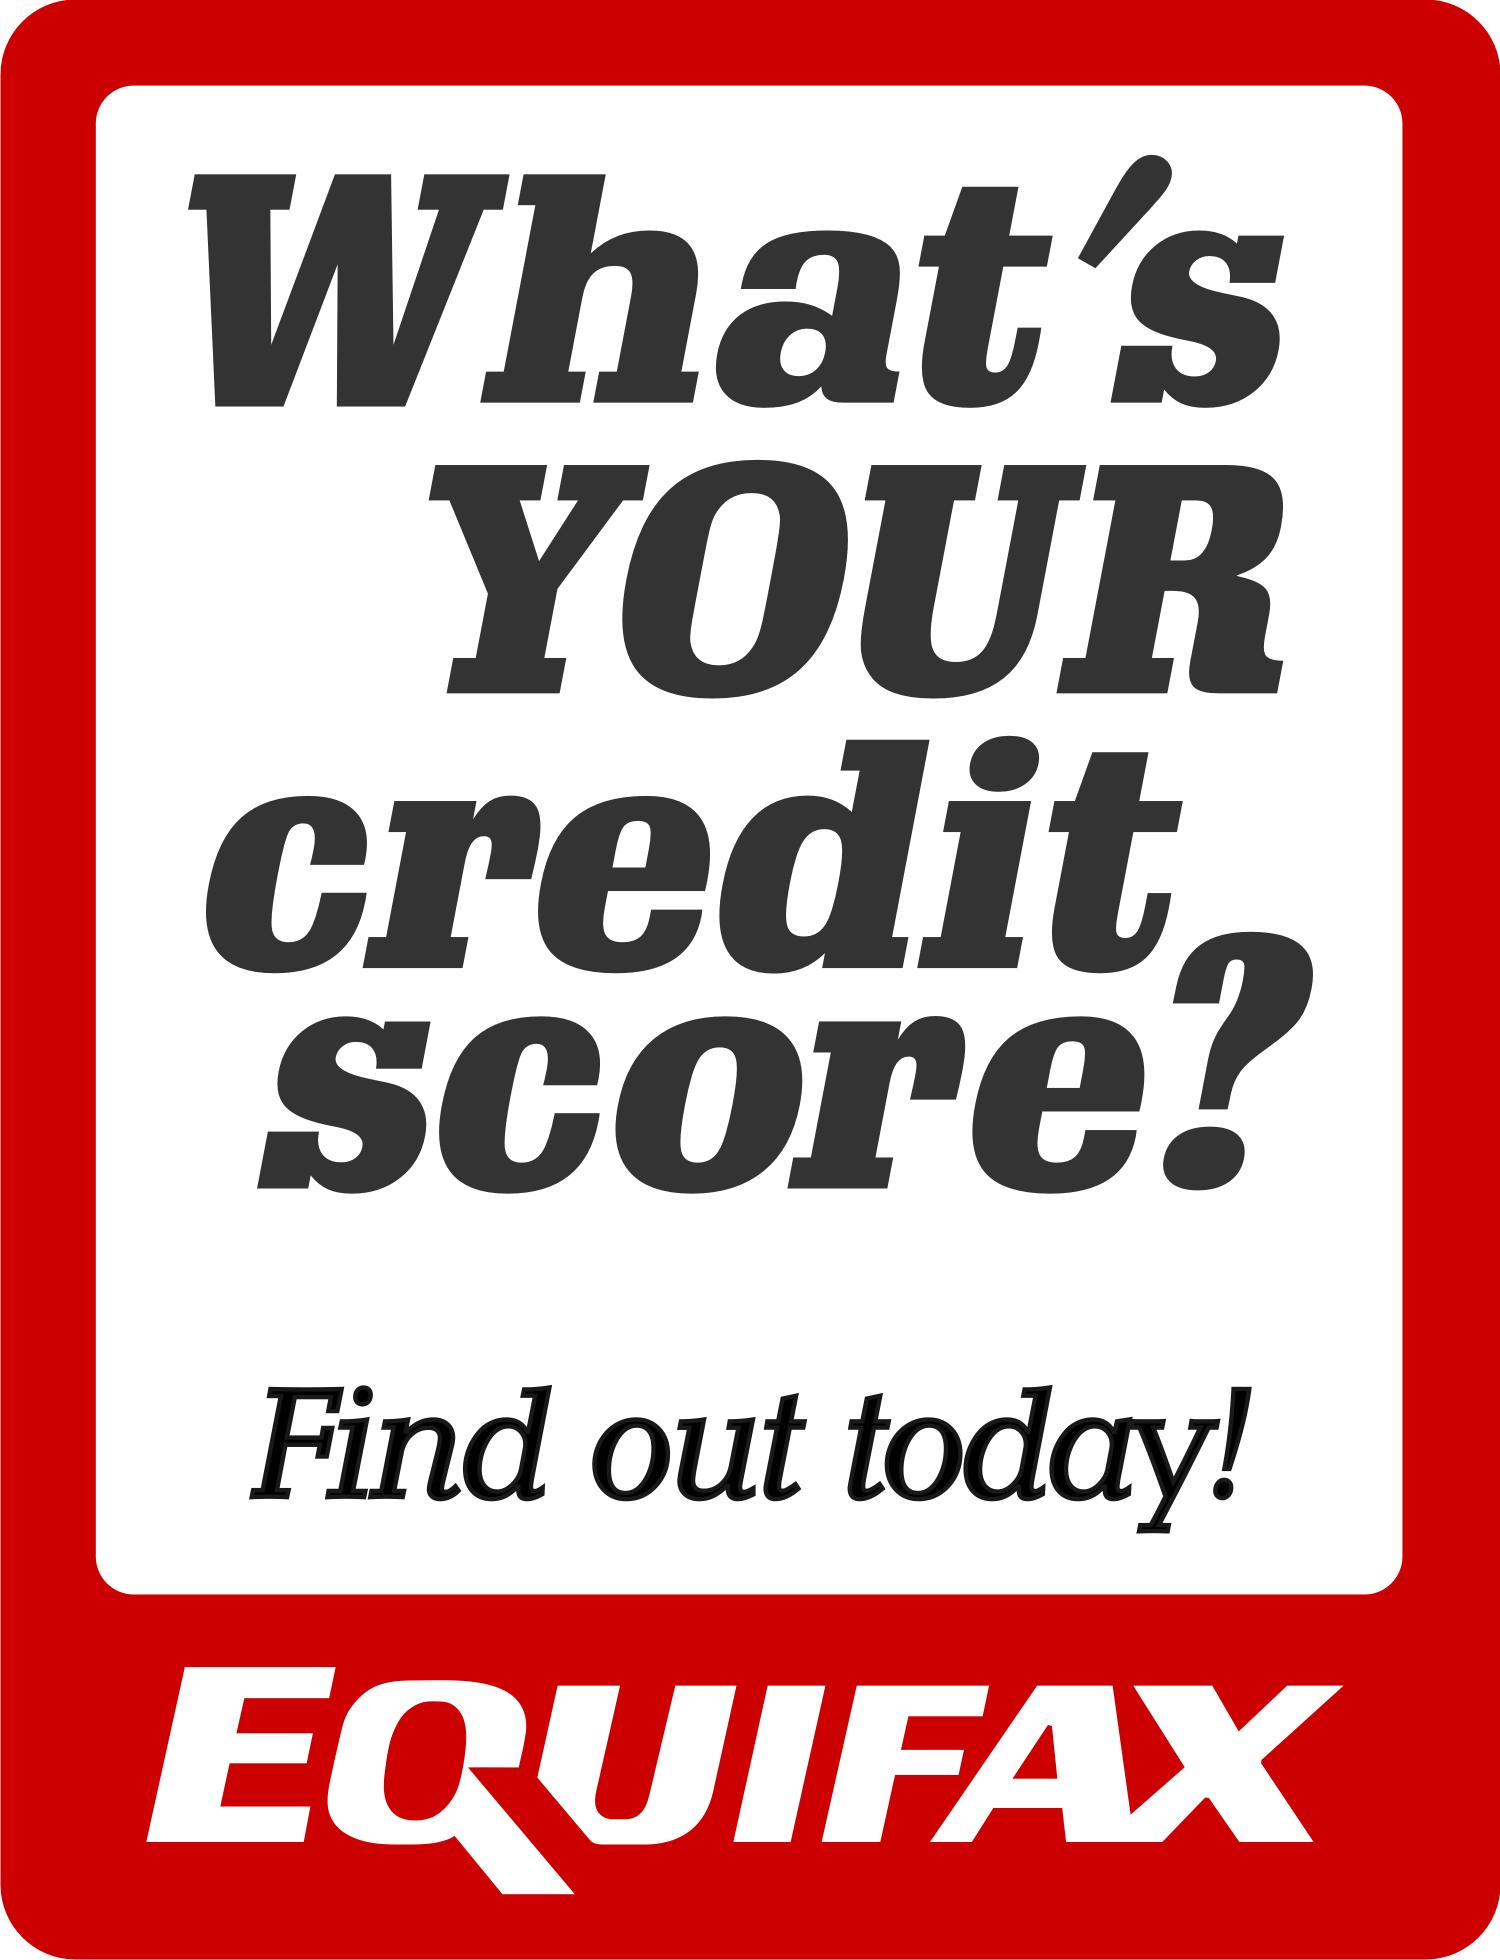 Buy aws credit coupon